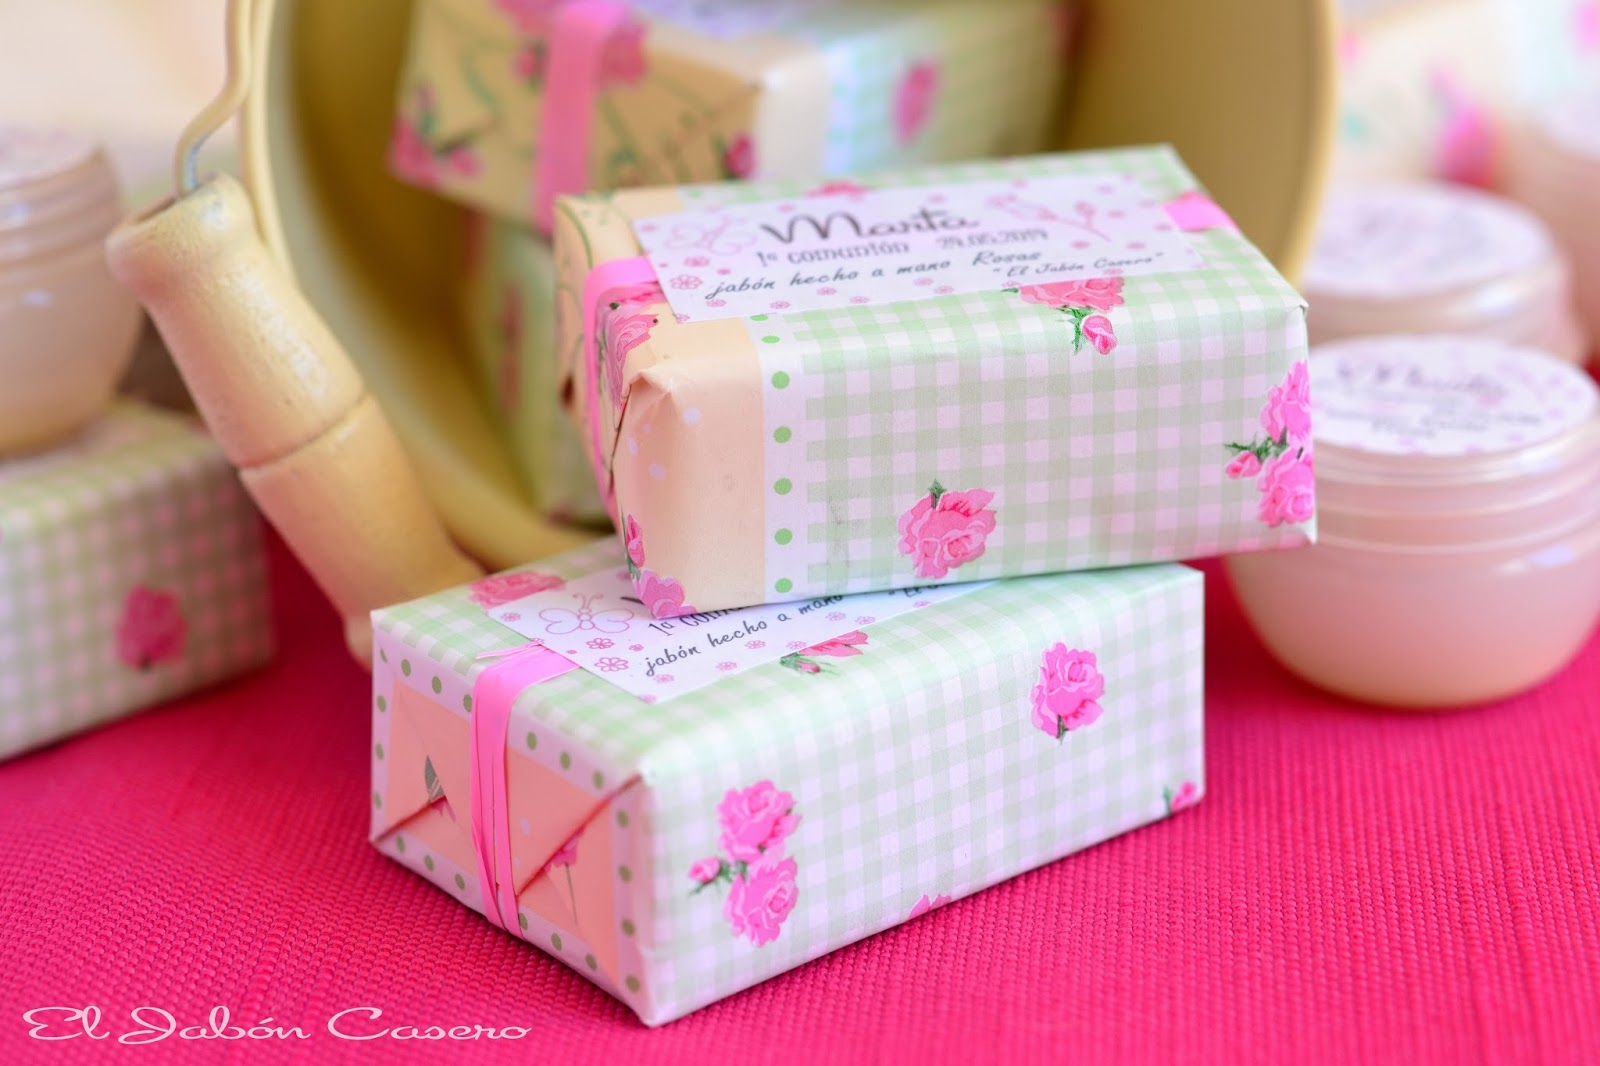 detalles comuniones jabones de rosas